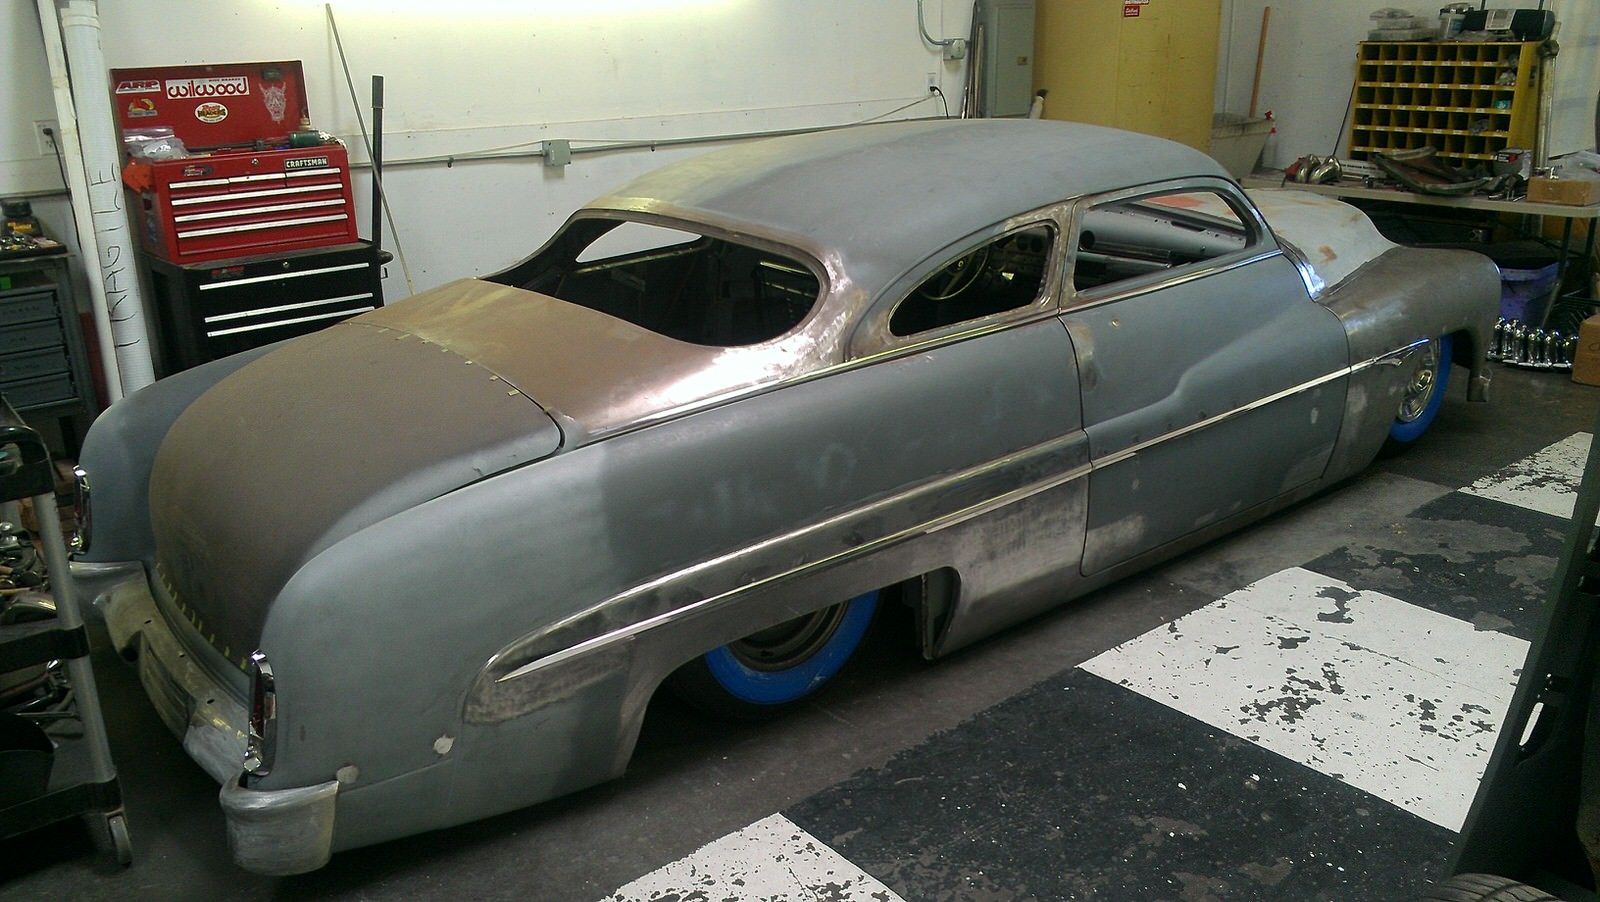 Nick Rogers 1951 Mercury (Ruggiero Mercury) - South City Rod & Custom